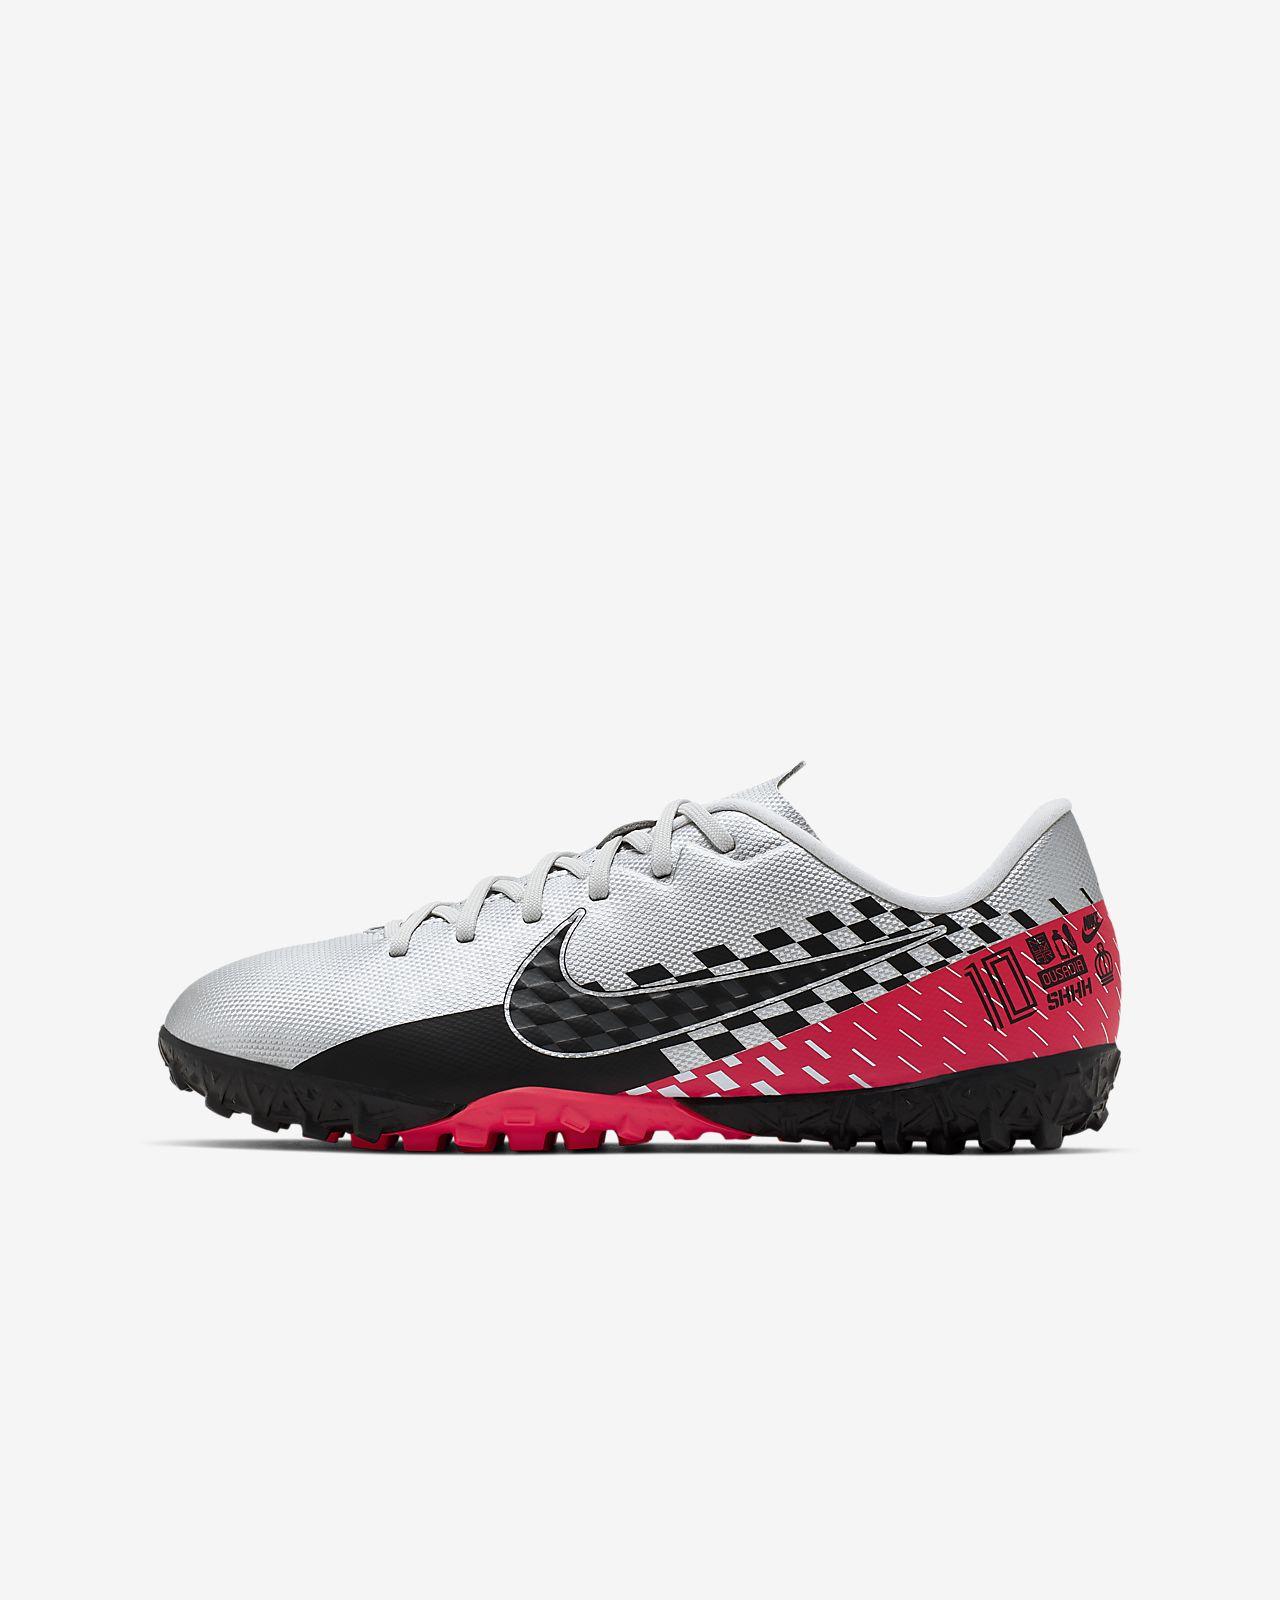 Nike Jr. Mercurial Vapor 13 Academy Neymar Jr. TF Younger/Older Kids' Artificial-Turf Football Shoe